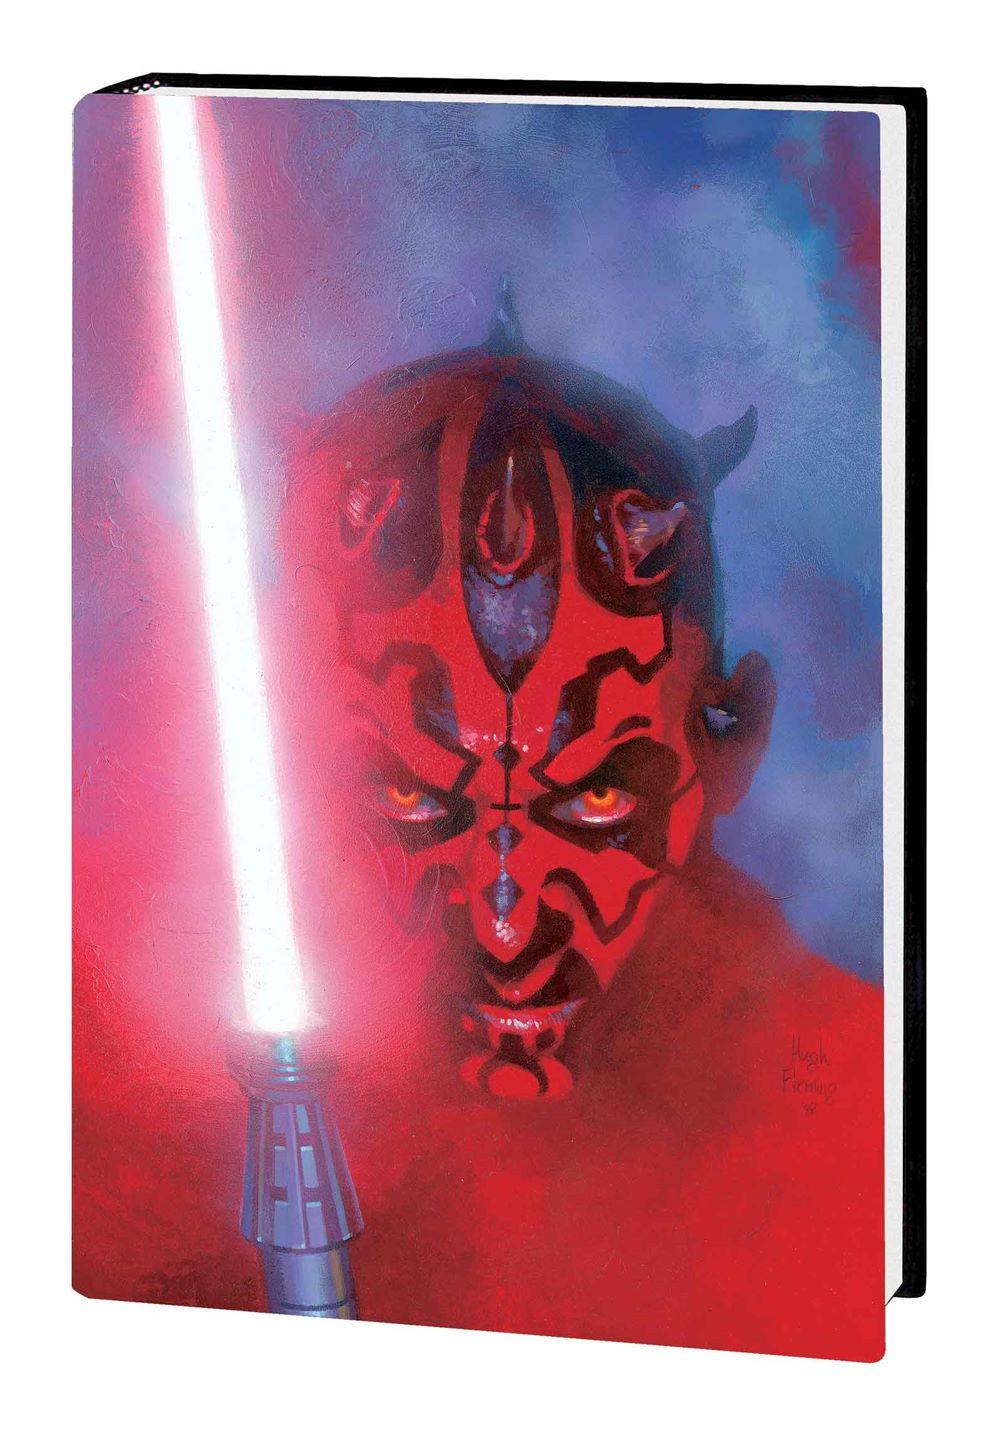 STAR_WARS_LED_ROTS_FLEMMING_HC Marvel Comics June 2021 Solicitations